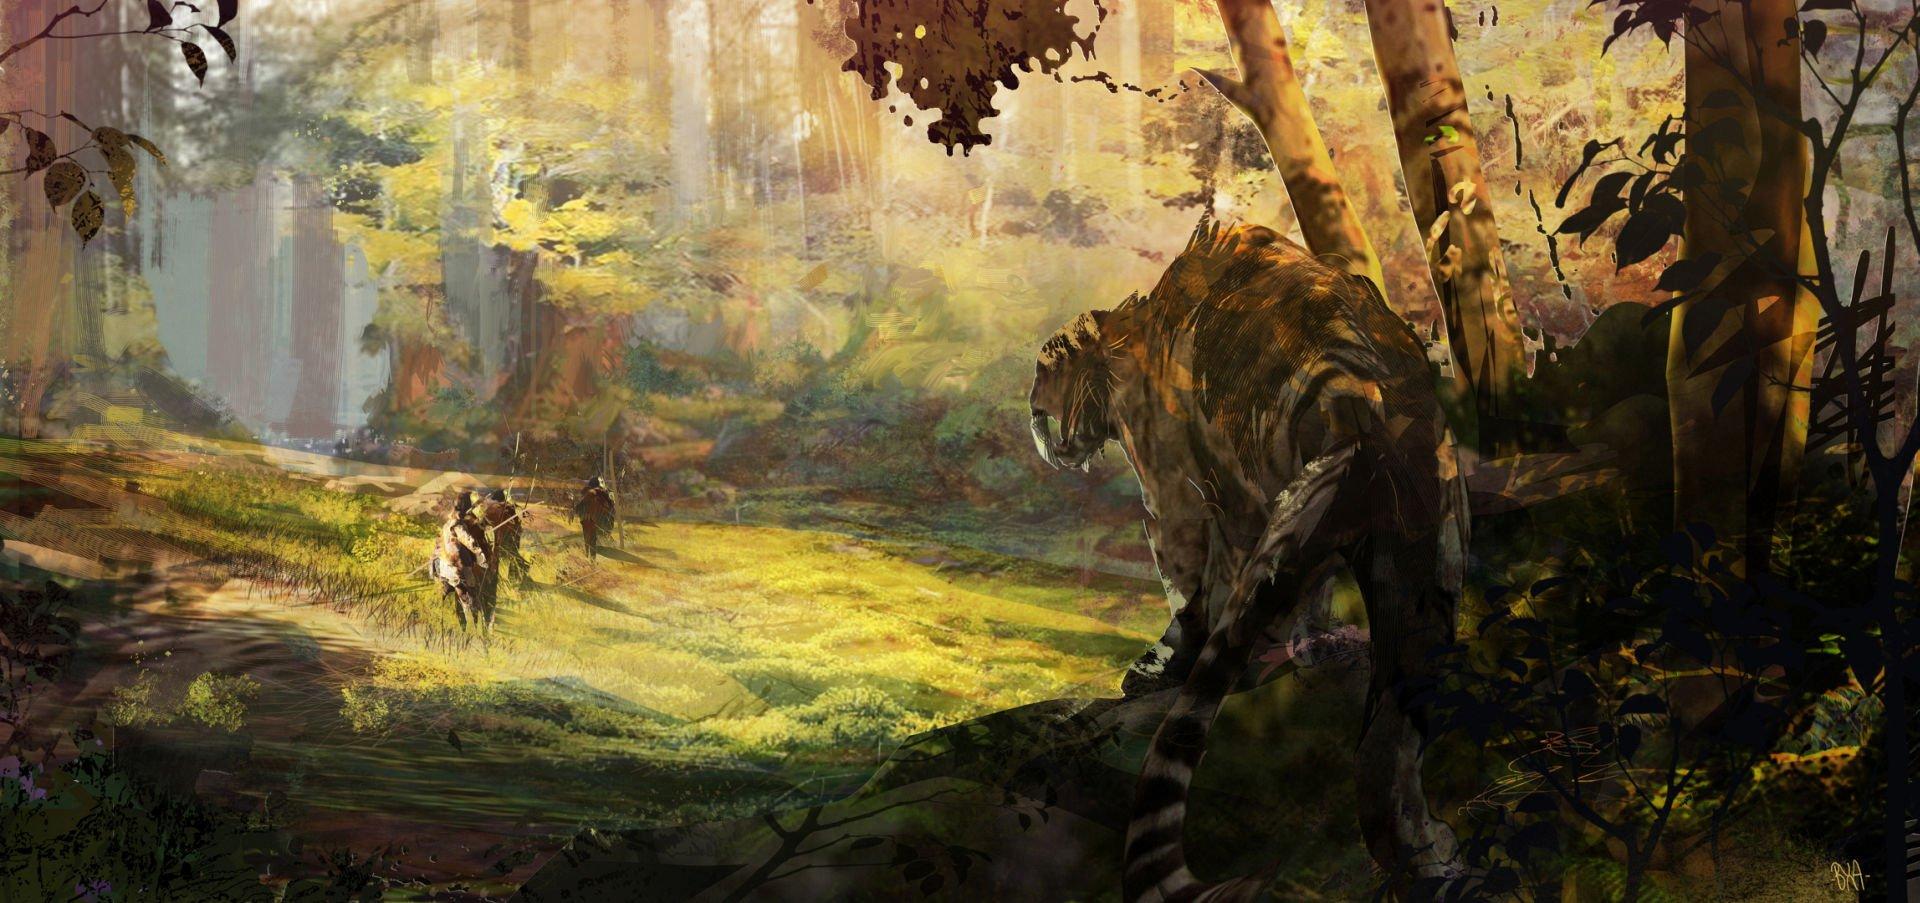 Far Cry Primal Artwork Video Games Wallpapers Hd: Far Cry Primal [PC] [Full] [Español]